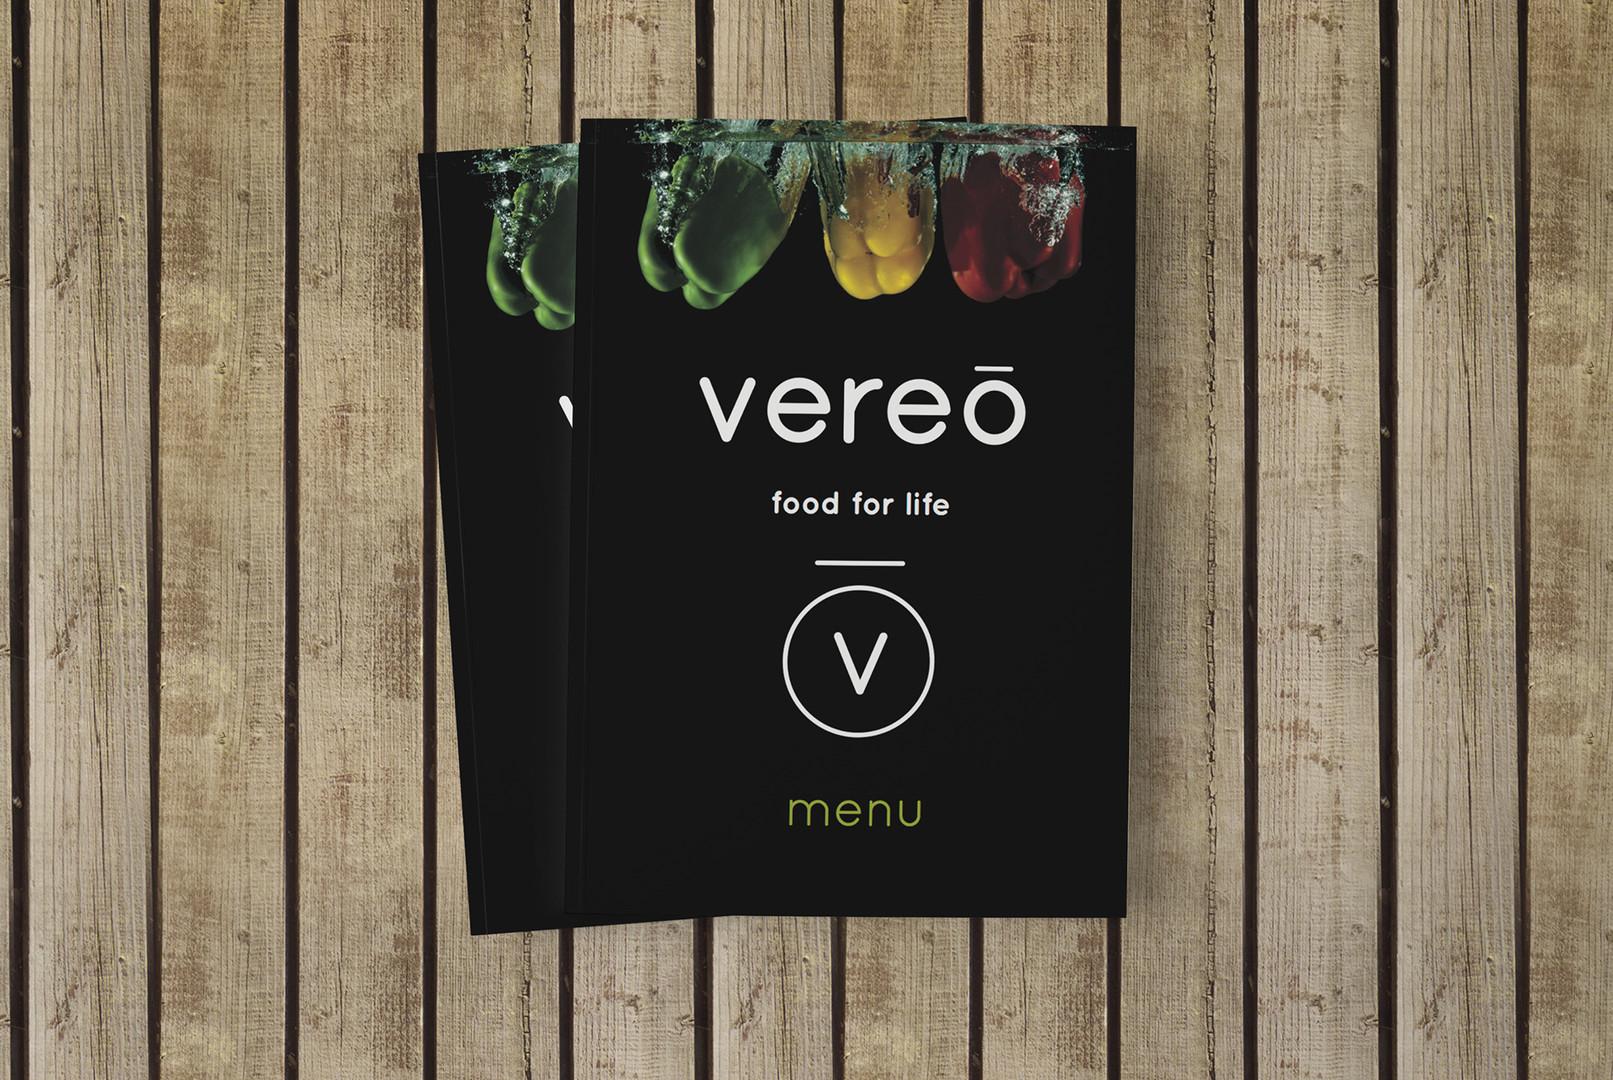 vereo menu2.jpg